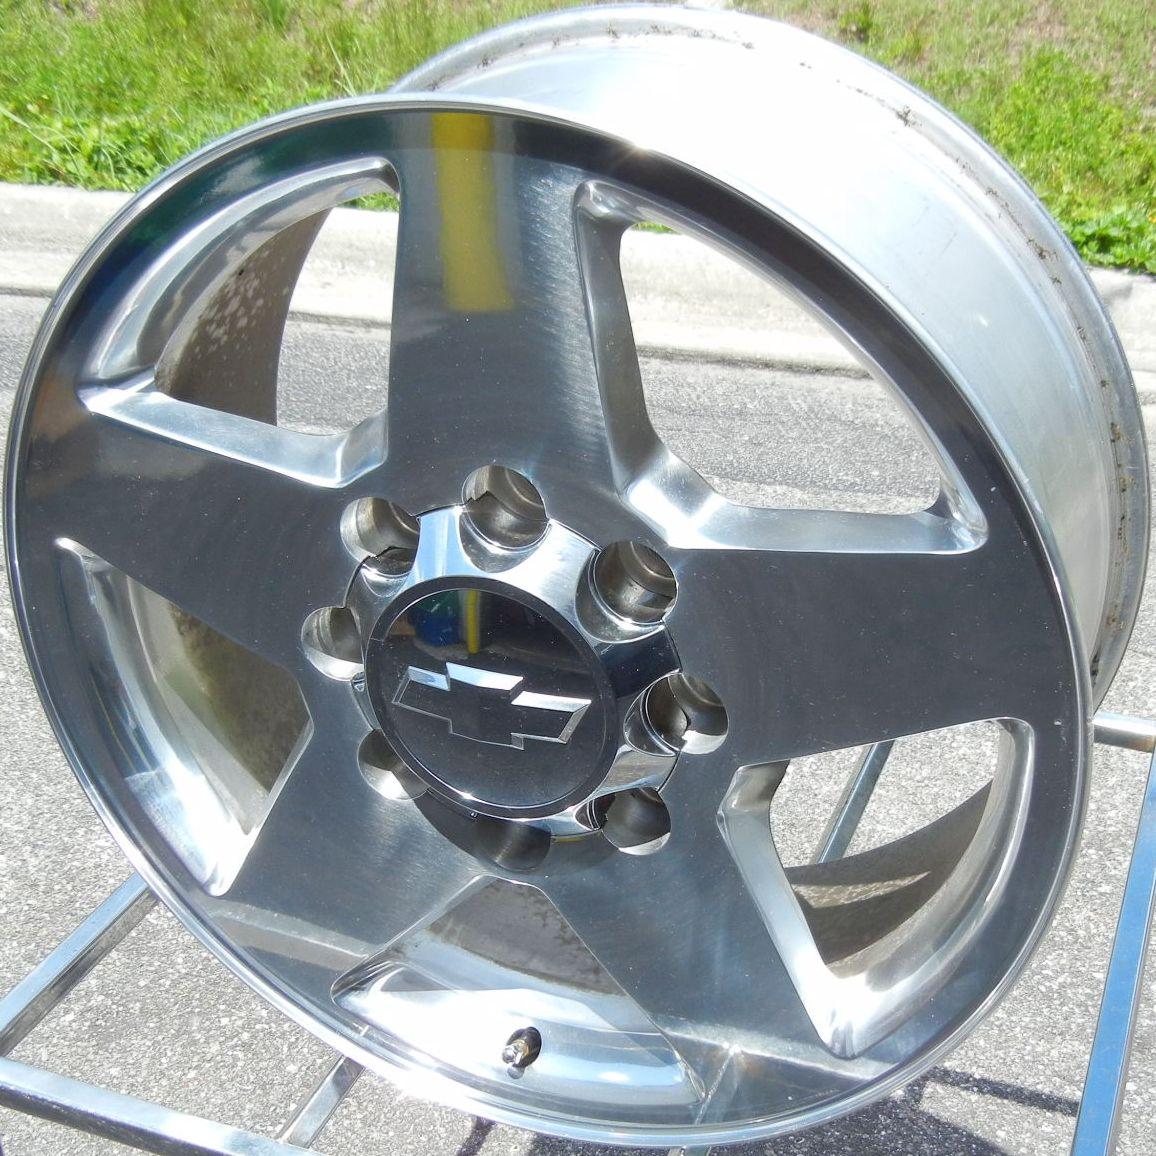 2011 2012 GMC Sierra Chevy Silverado 2500 3500 Polished Wheels Rims